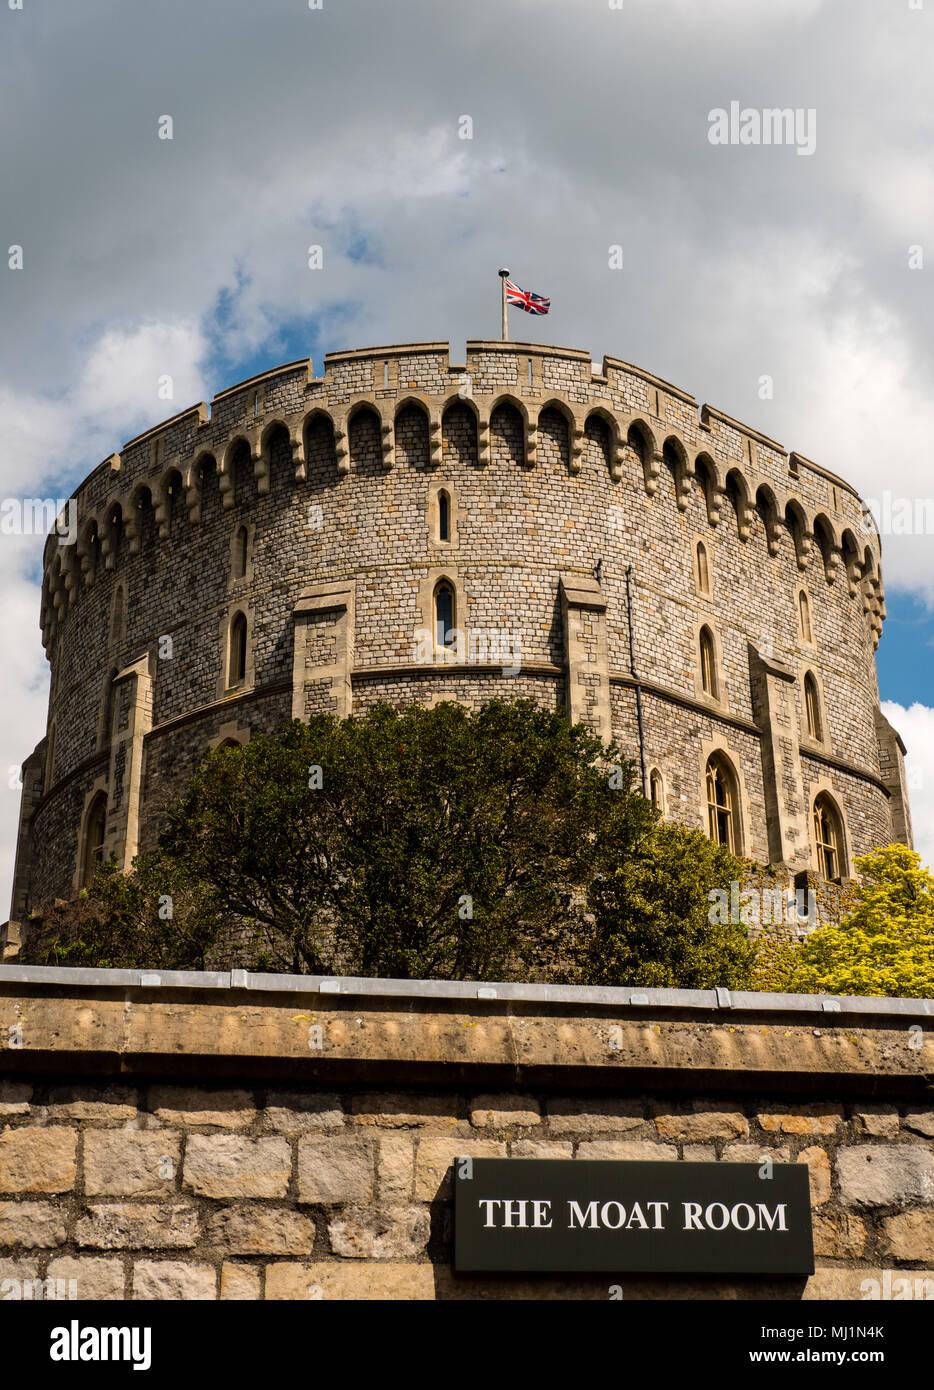 La Torre del Homenaje, Torre Redonda, El Castillo de Windsor, Windsor, Berkshire, Inglaterra, Reino Unido, GB. Foto de stock